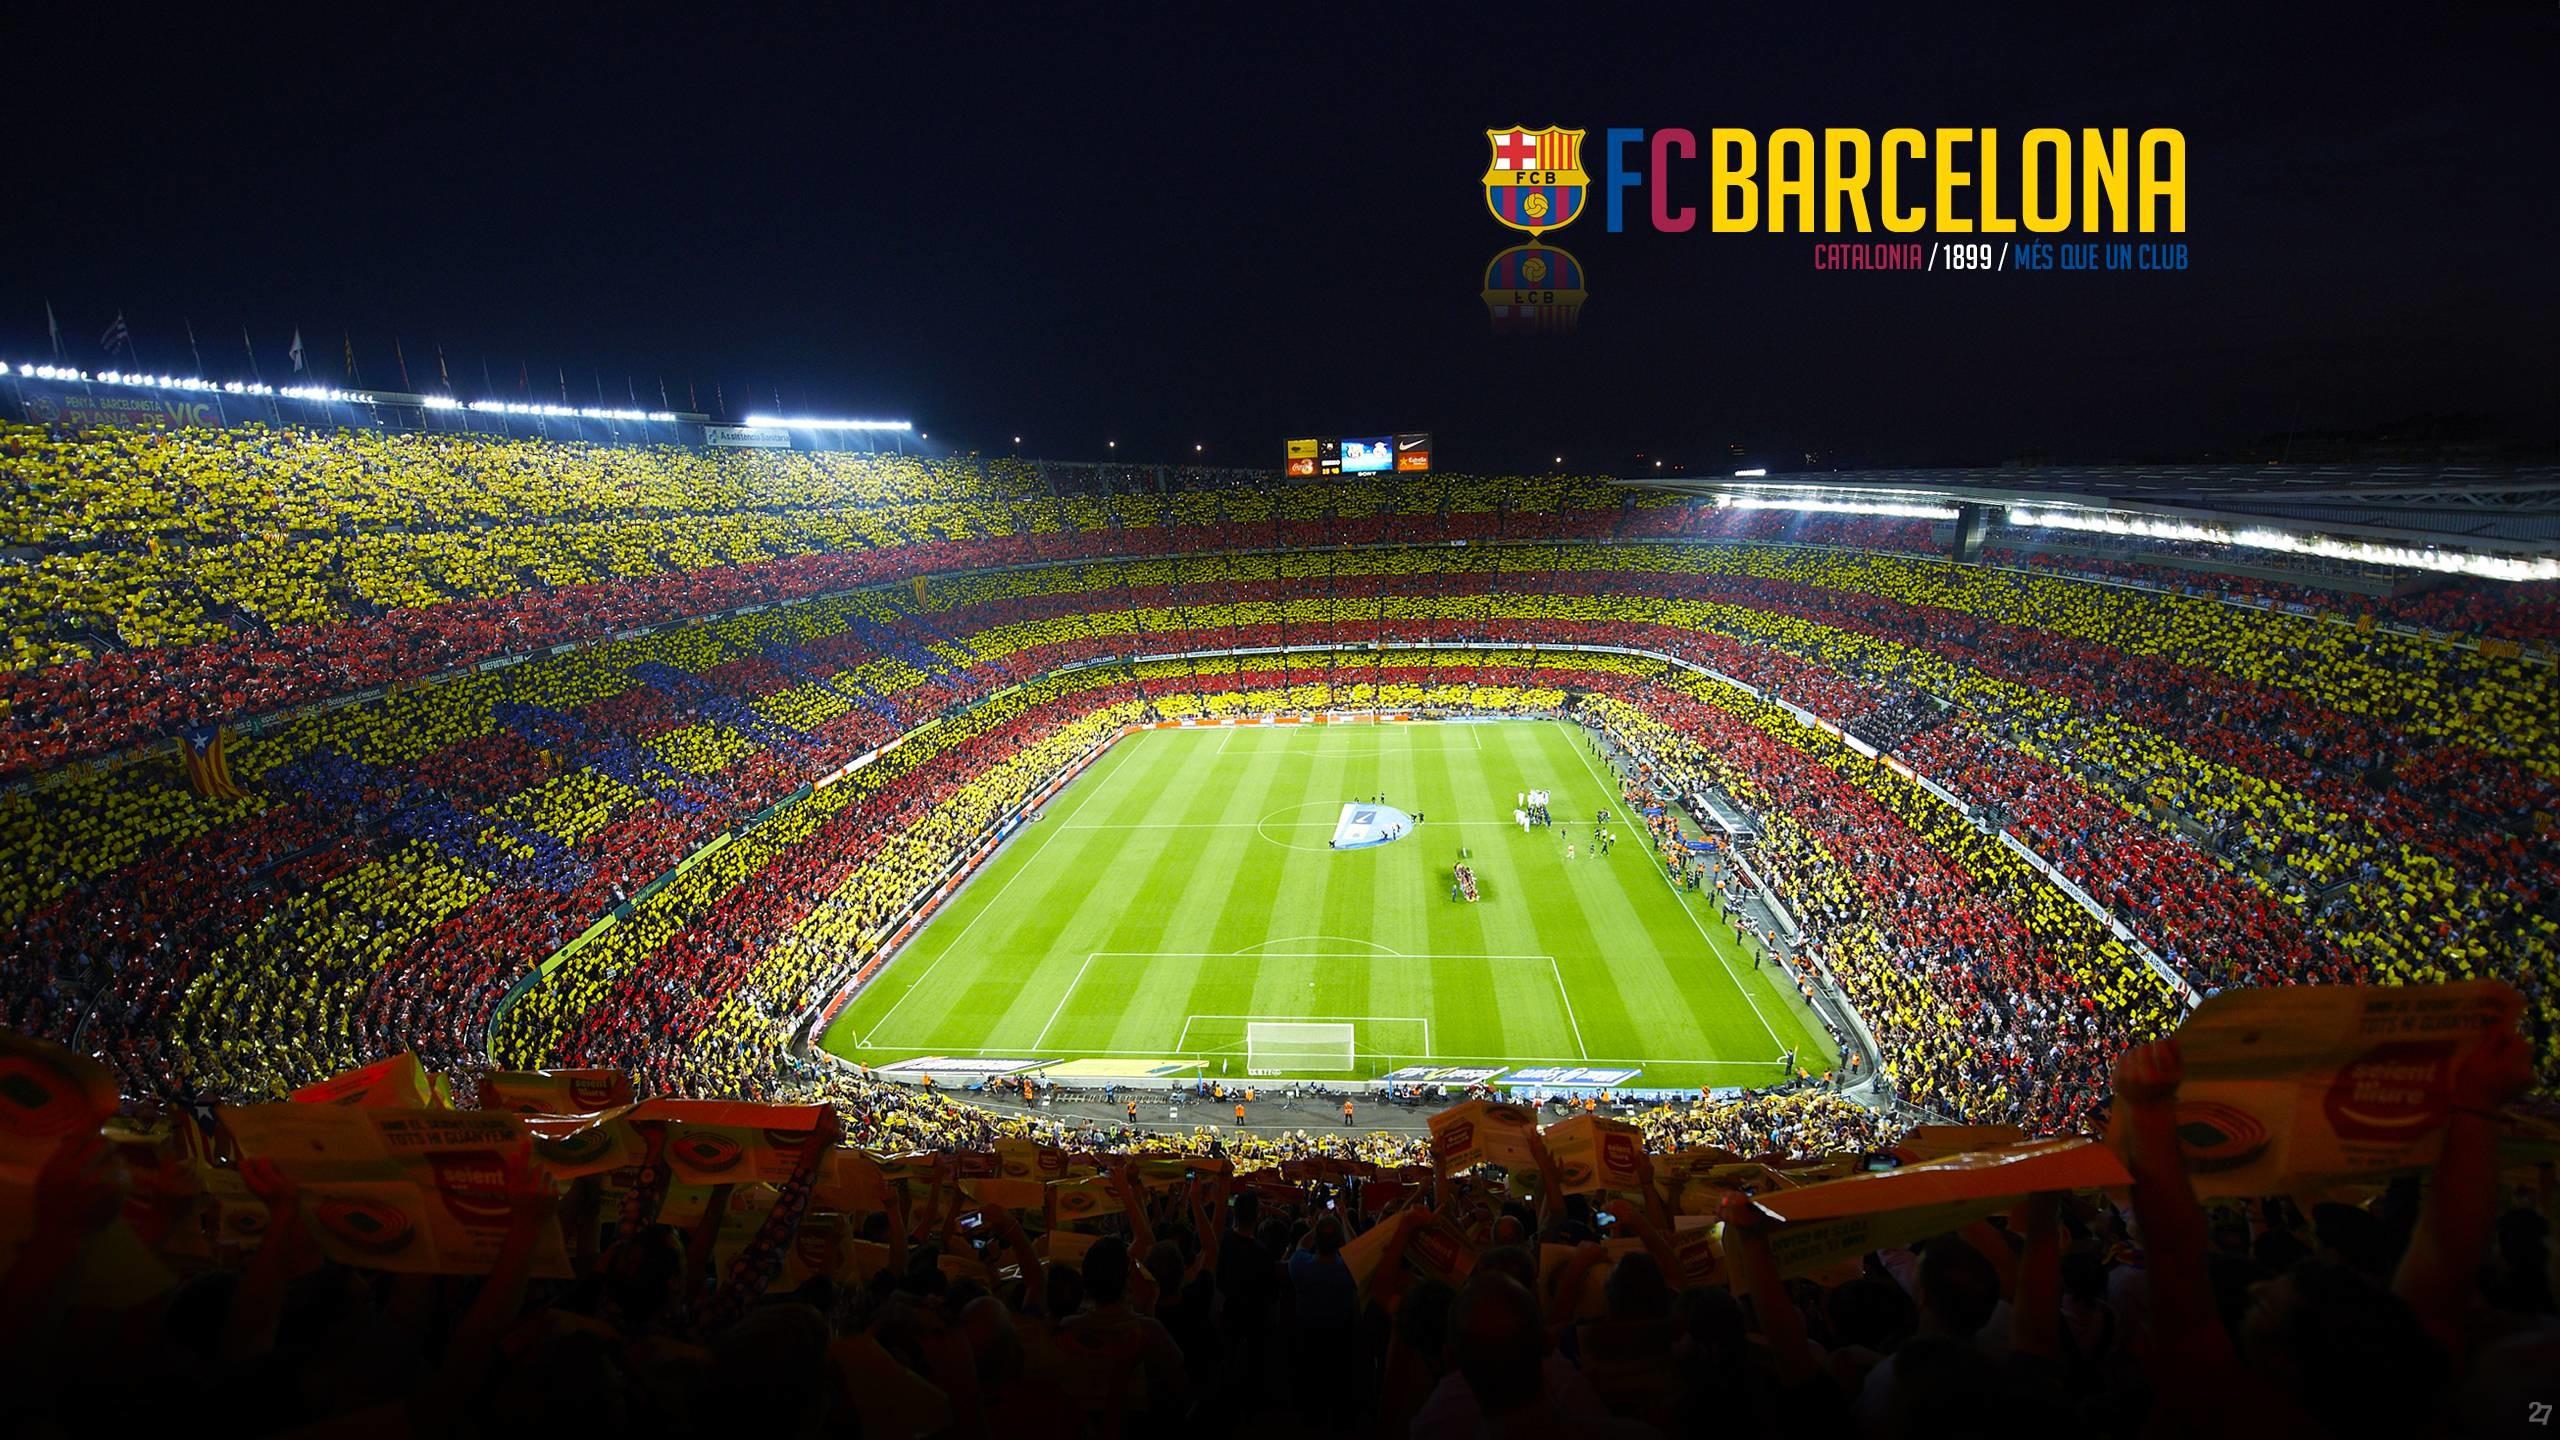 New Nike Barcelona HD Wallpapers Of Football Full HD 1080p Desktop Backgrounds For PC Mac Laptop